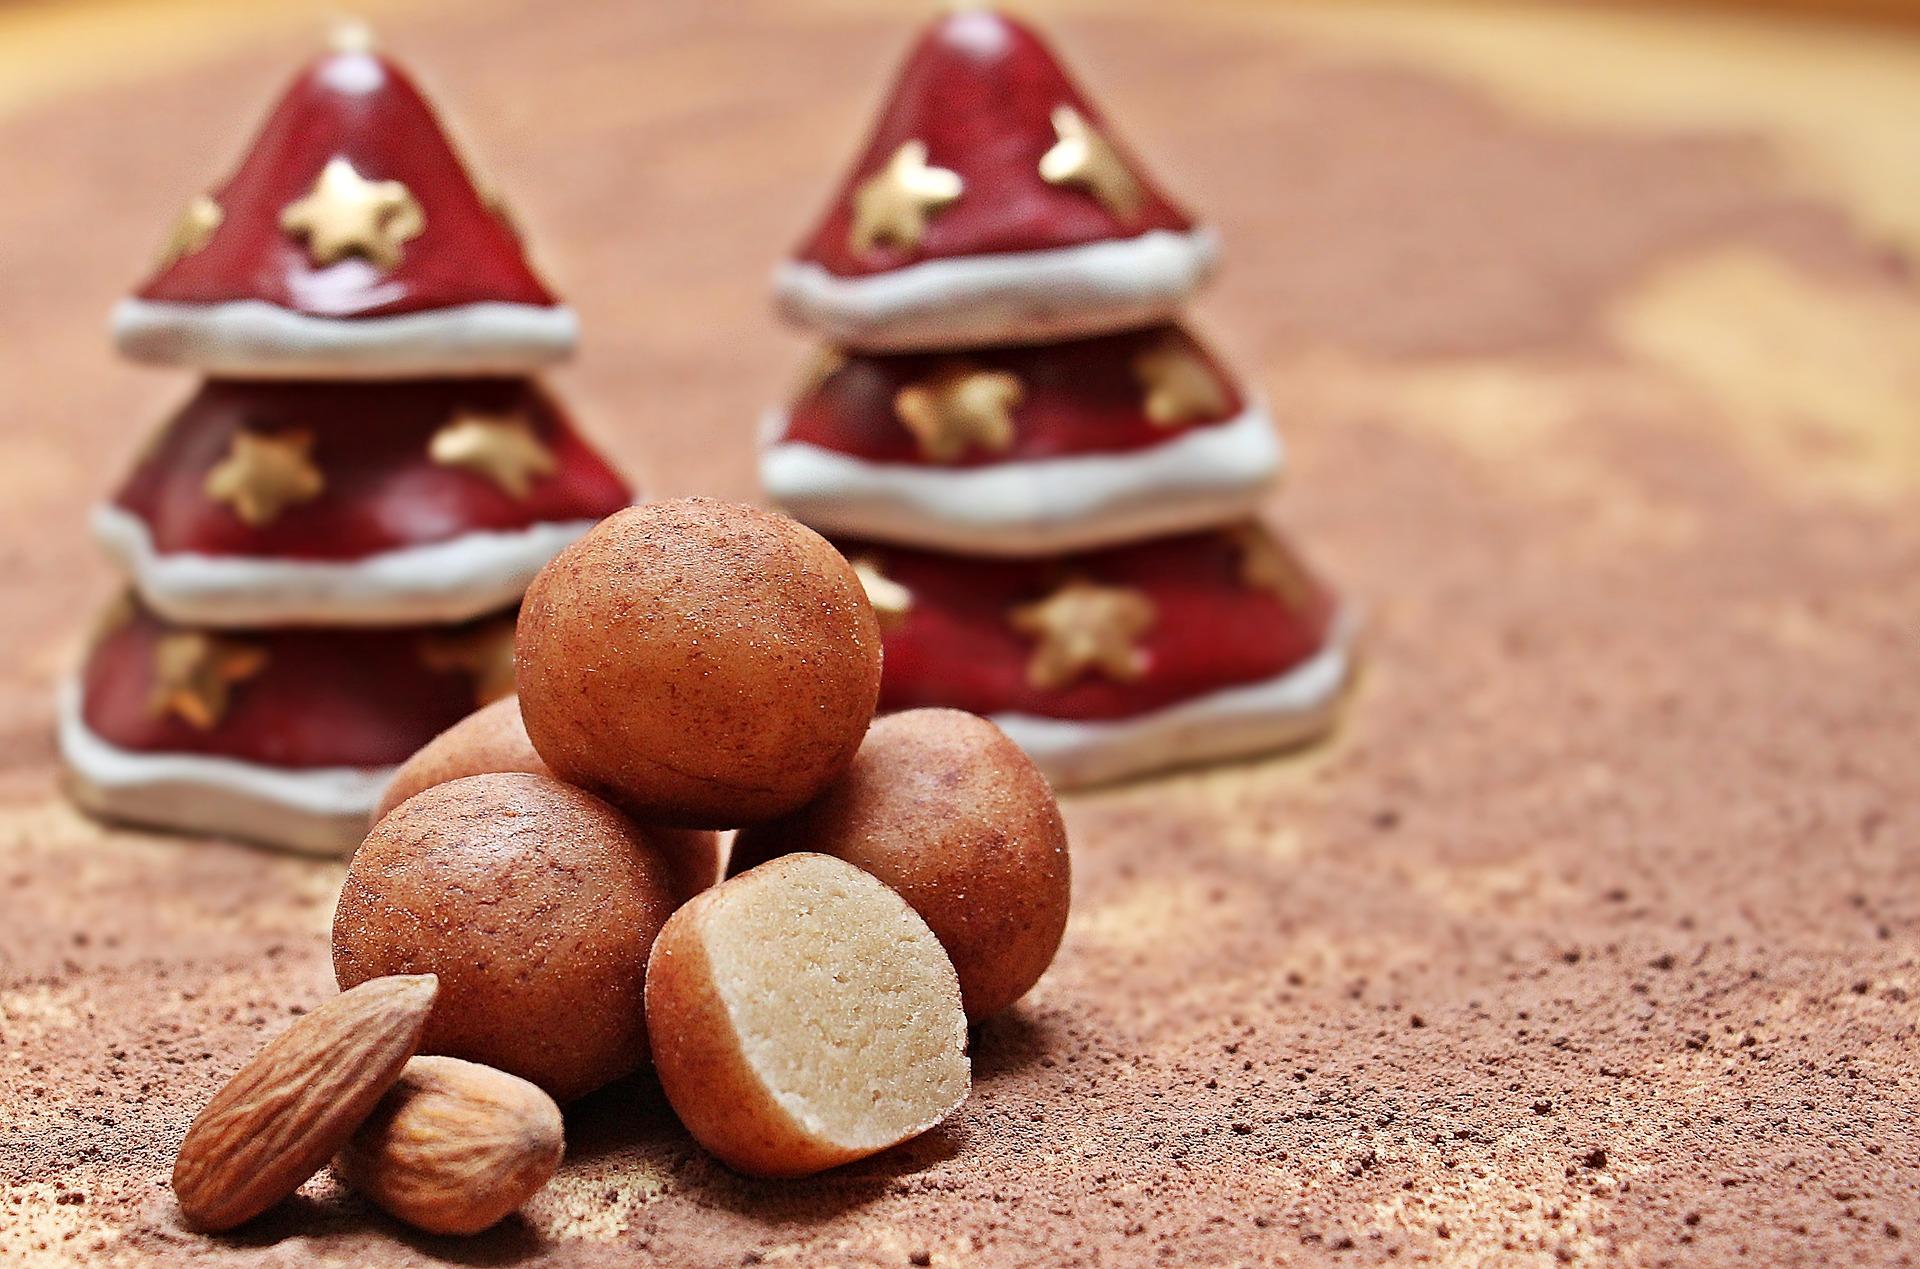 marzipan, marzipankartoffeln, potato, balls, sugar Germany, dessert, christmas, festive, baking, recipes